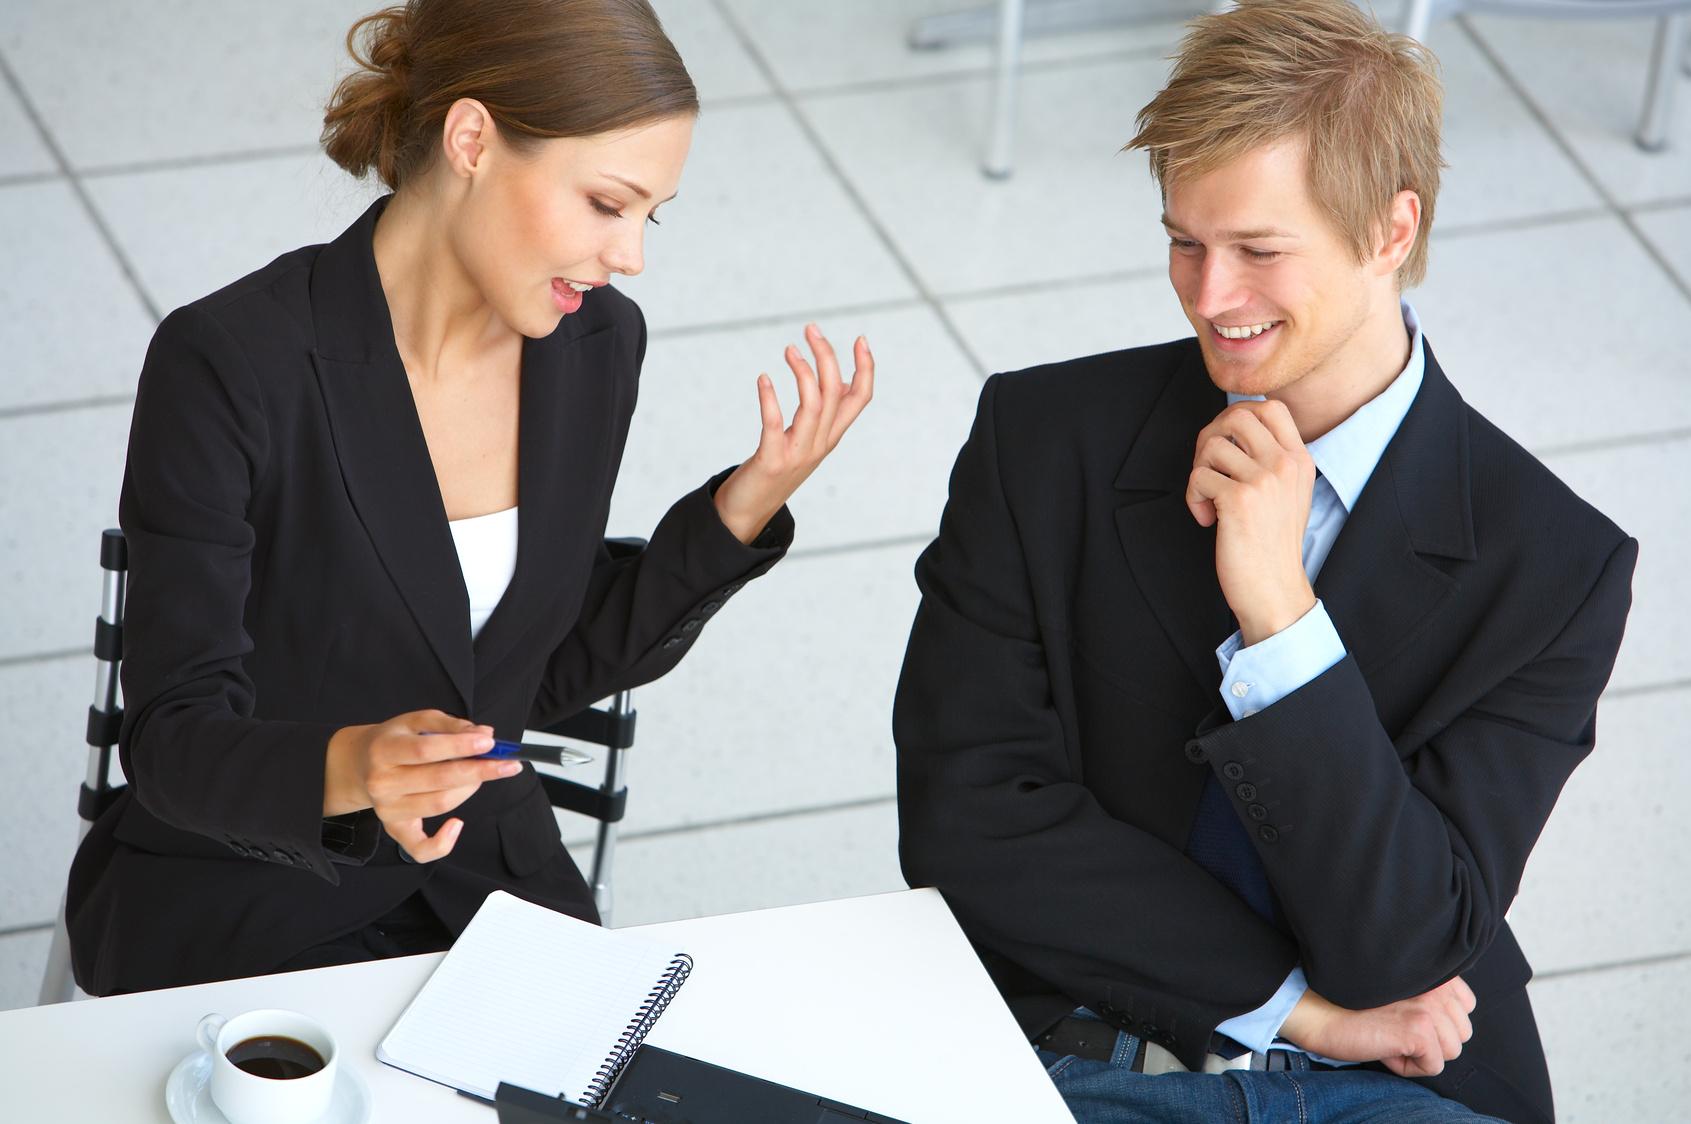 Grafik ispakademie und it-business-talk